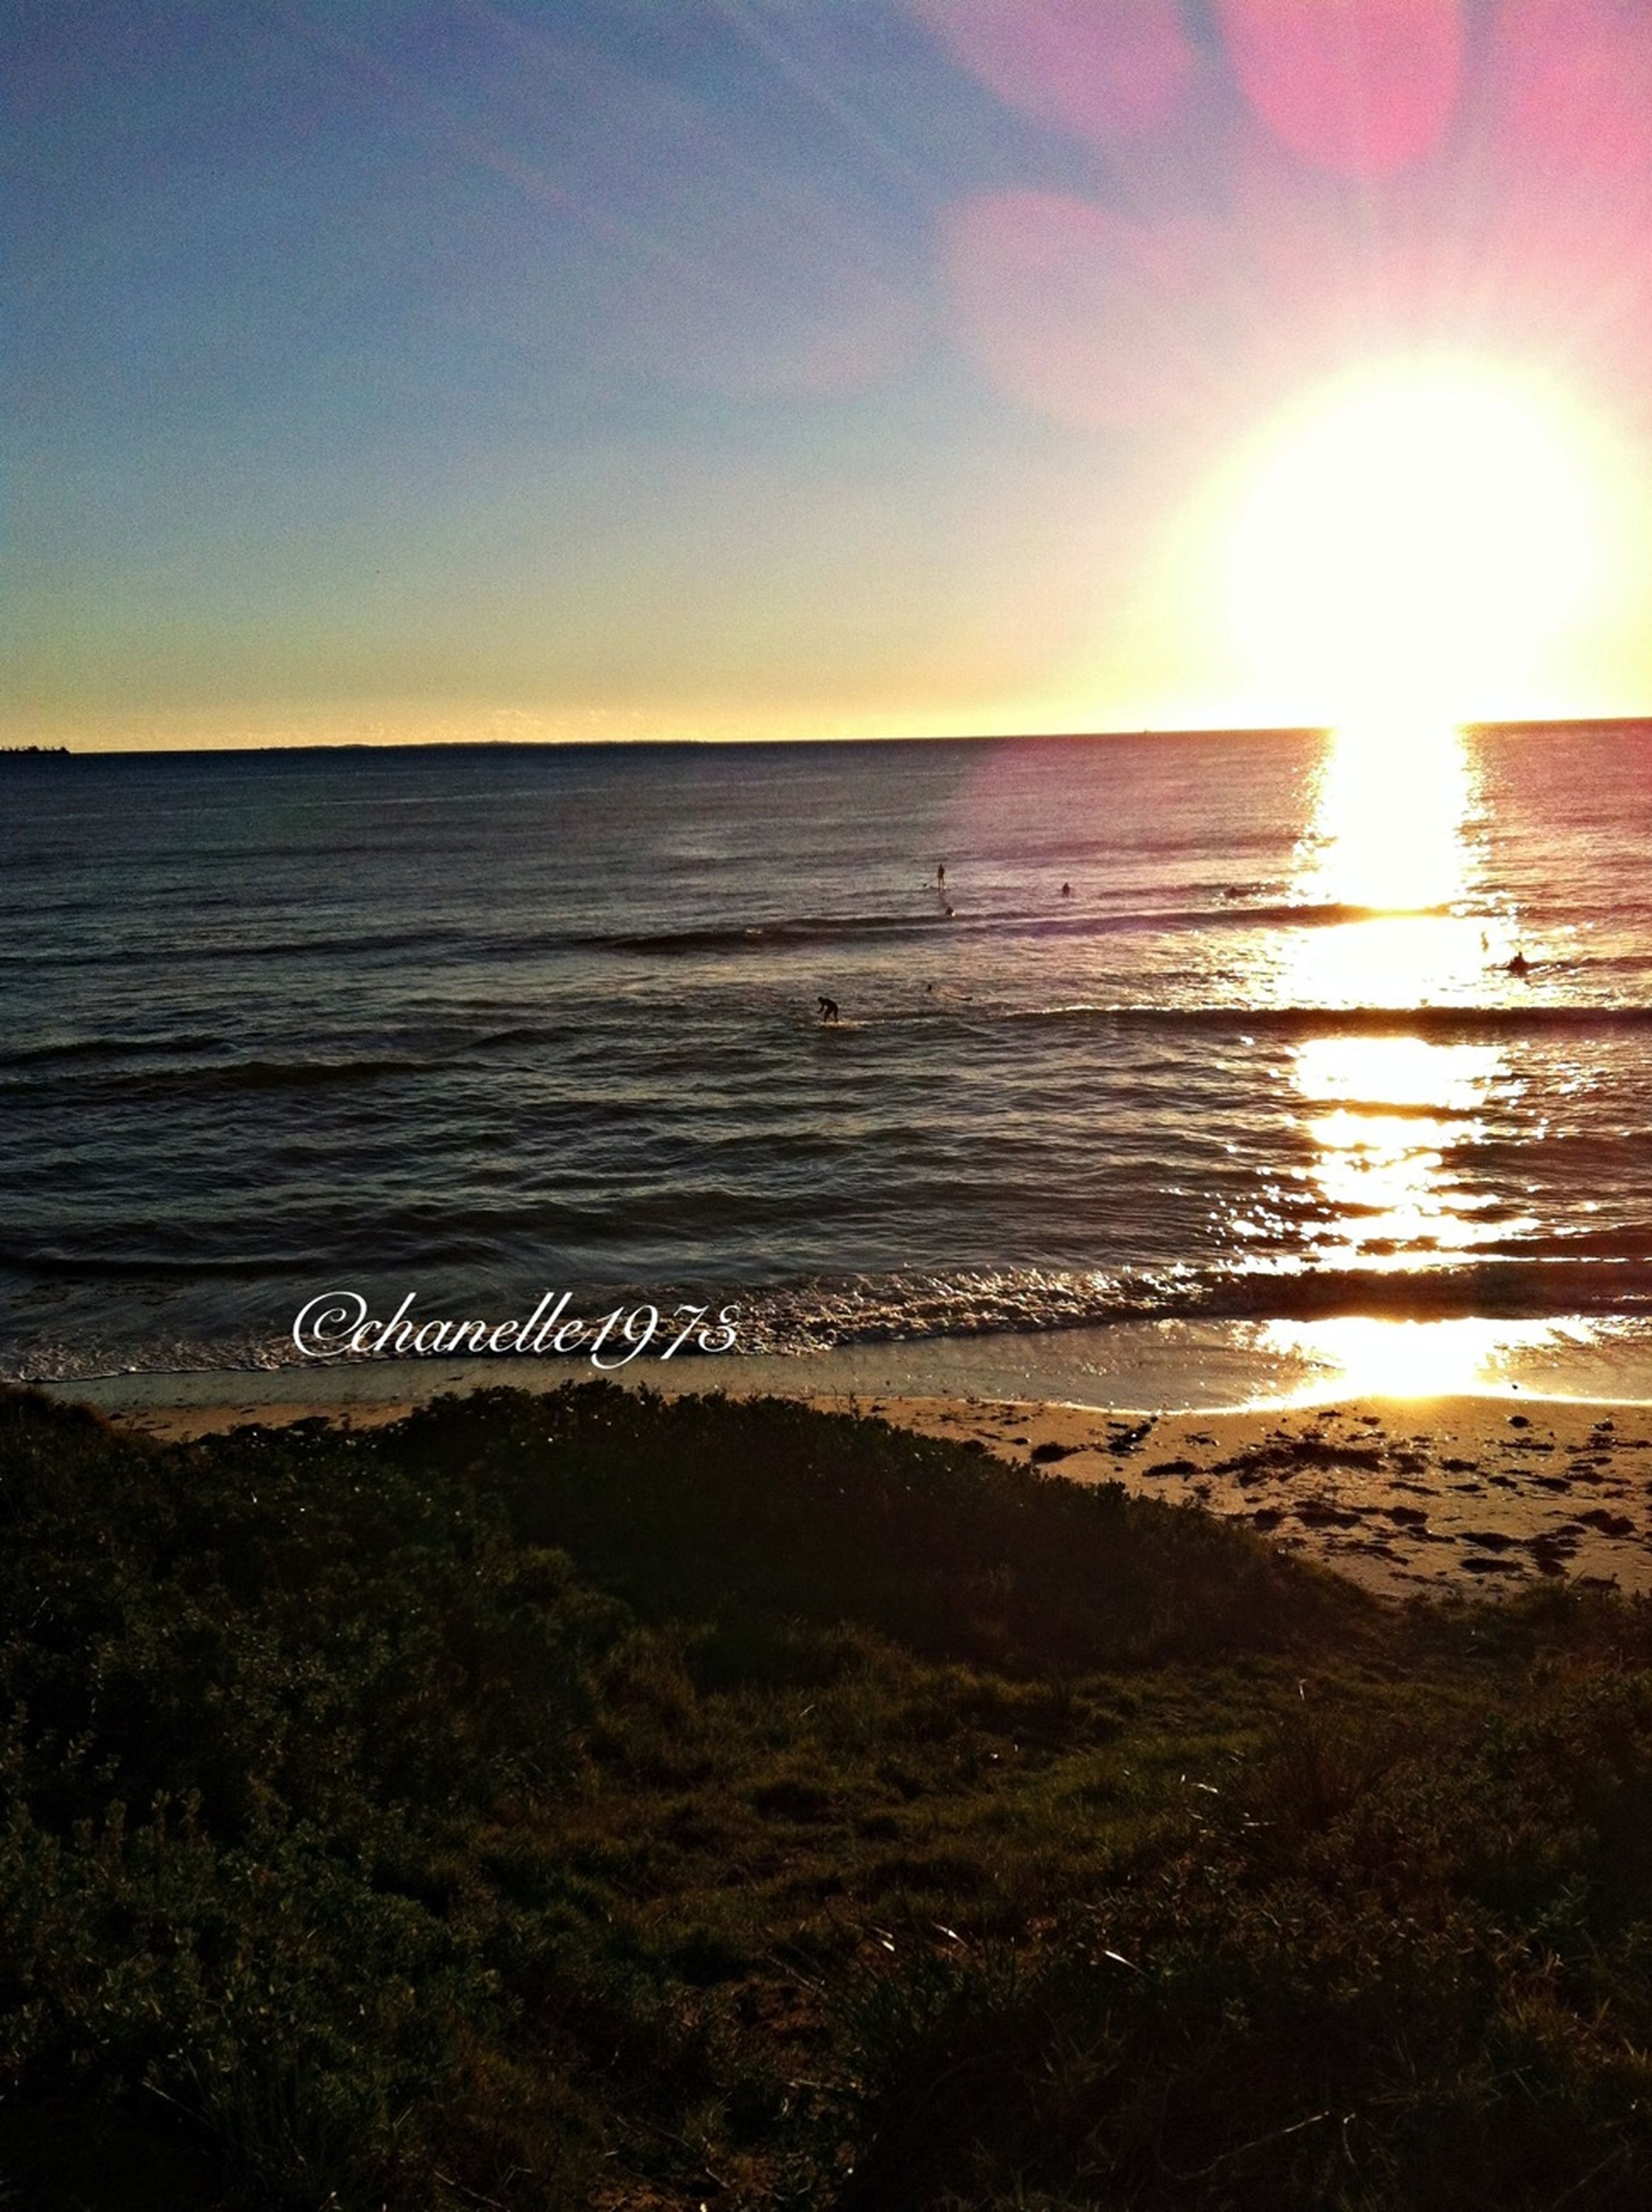 sea, sun, horizon over water, water, beach, sunset, tranquil scene, scenics, tranquility, shore, beauty in nature, sunlight, sand, nature, idyllic, sky, sunbeam, lens flare, clear sky, wave